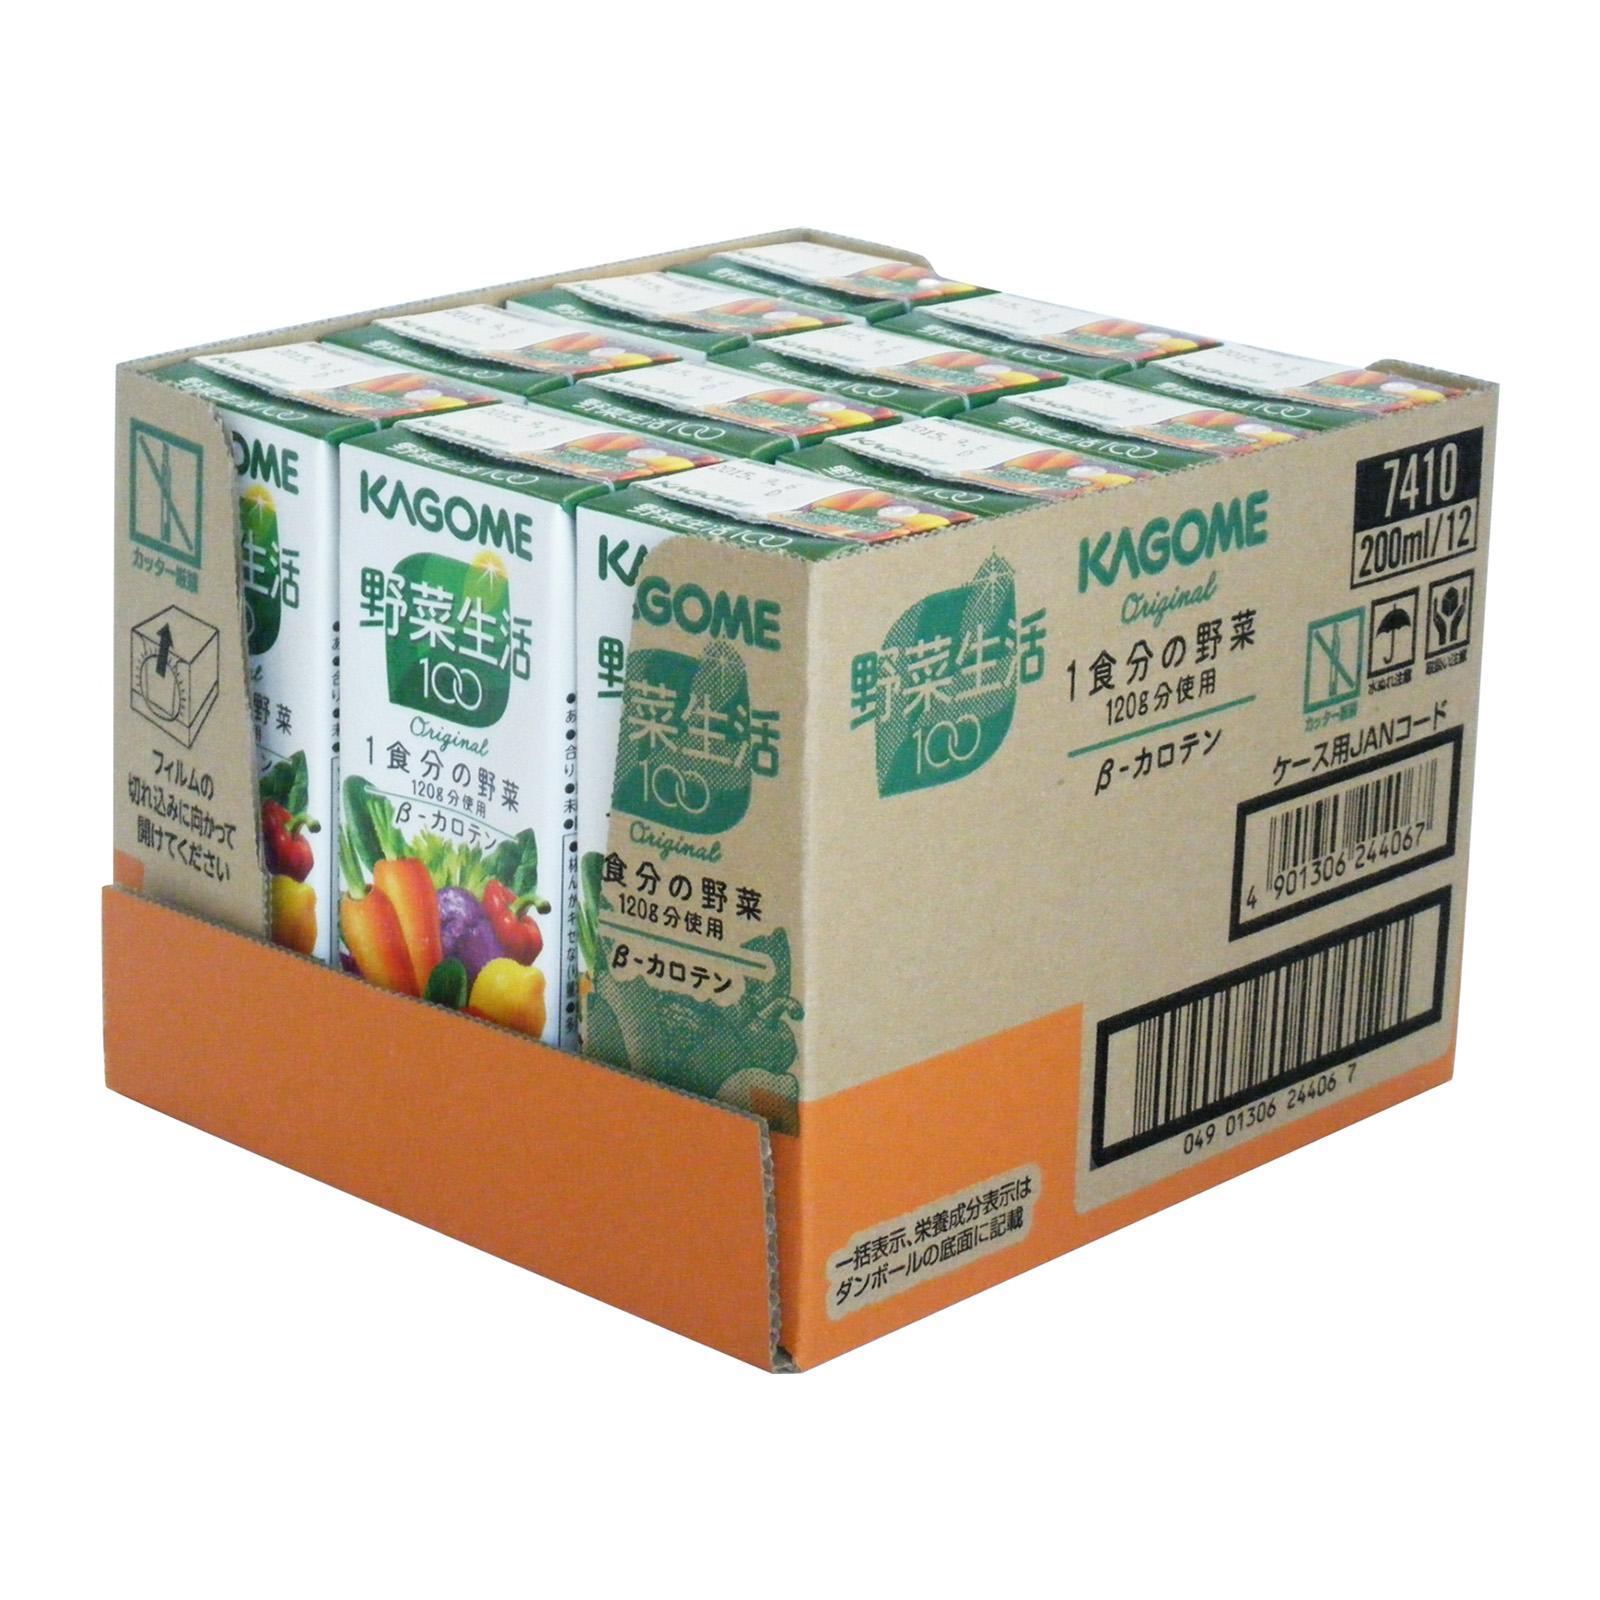 Kagome Original Vegetable Juice - Case By Redmart.